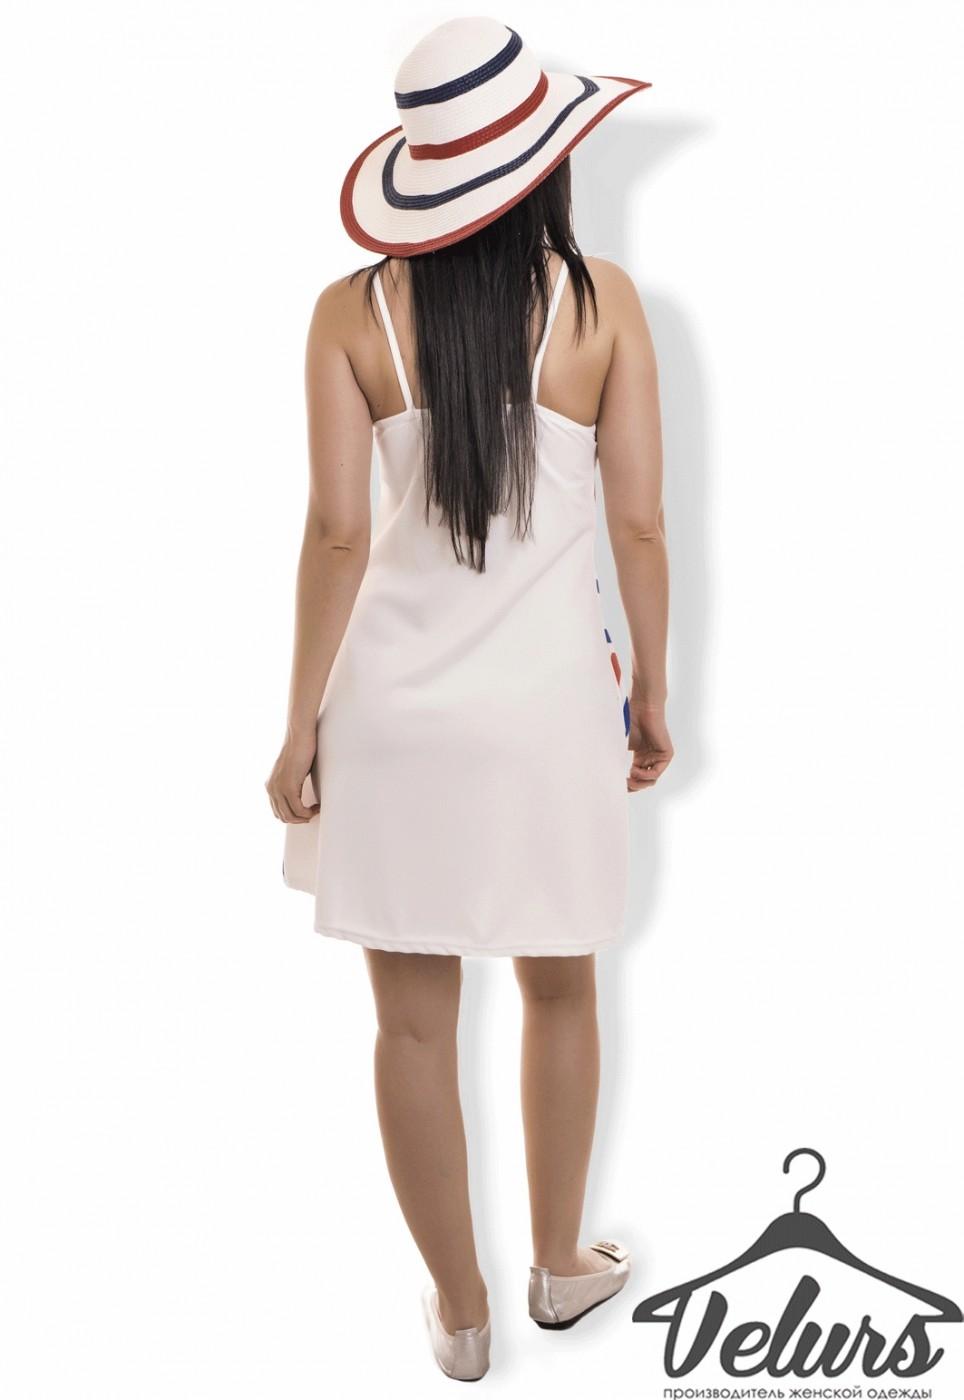 Velurs: Платье 21954 - фото 3